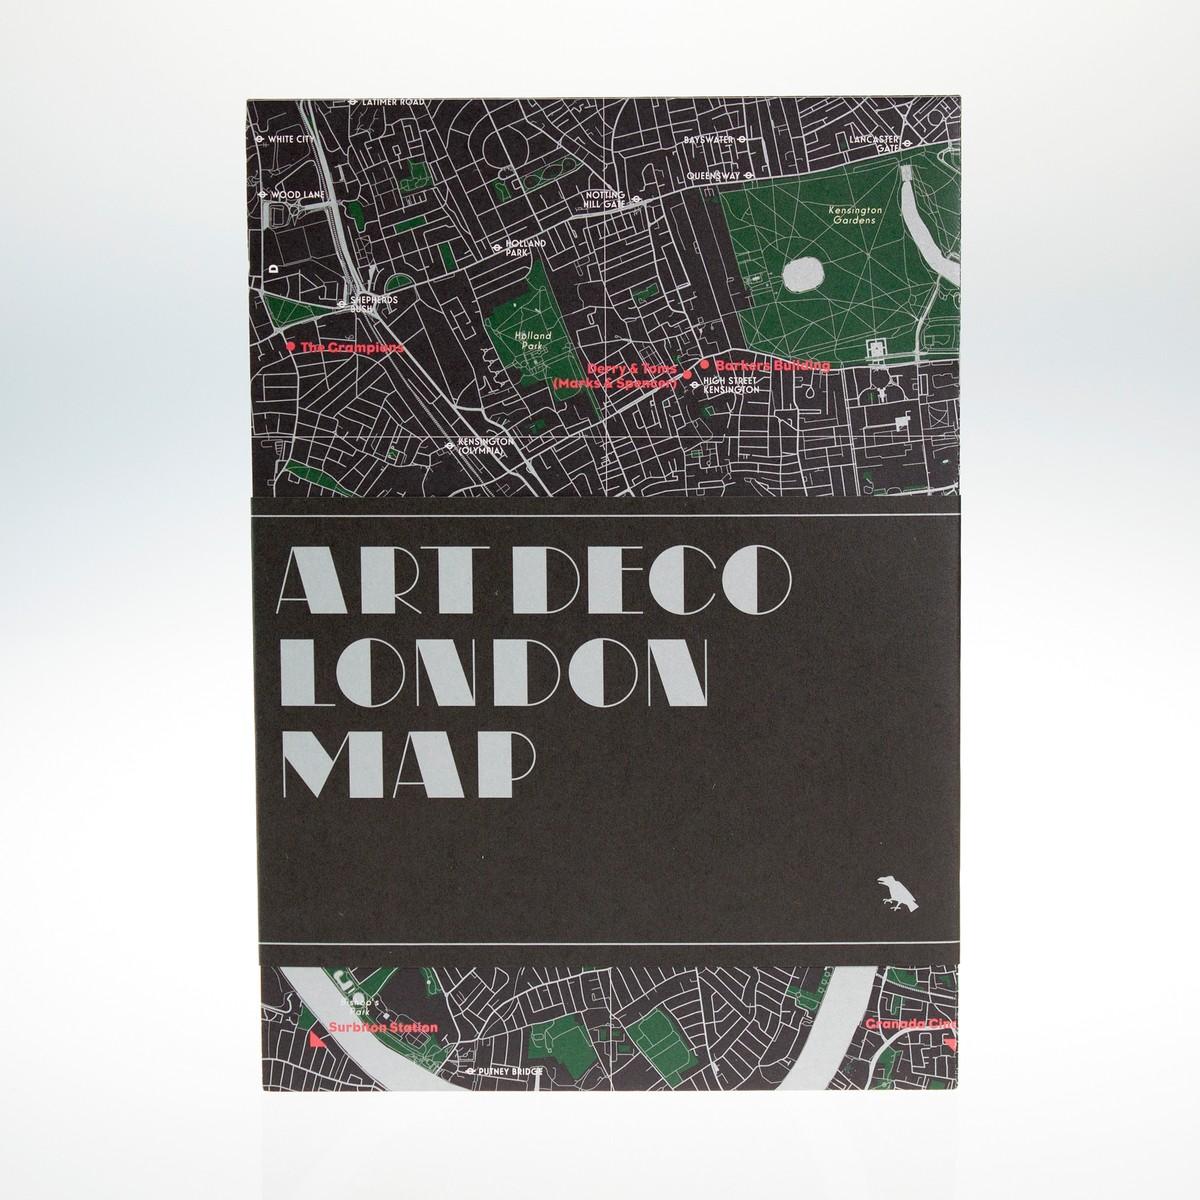 Photo of Art Deco London Map